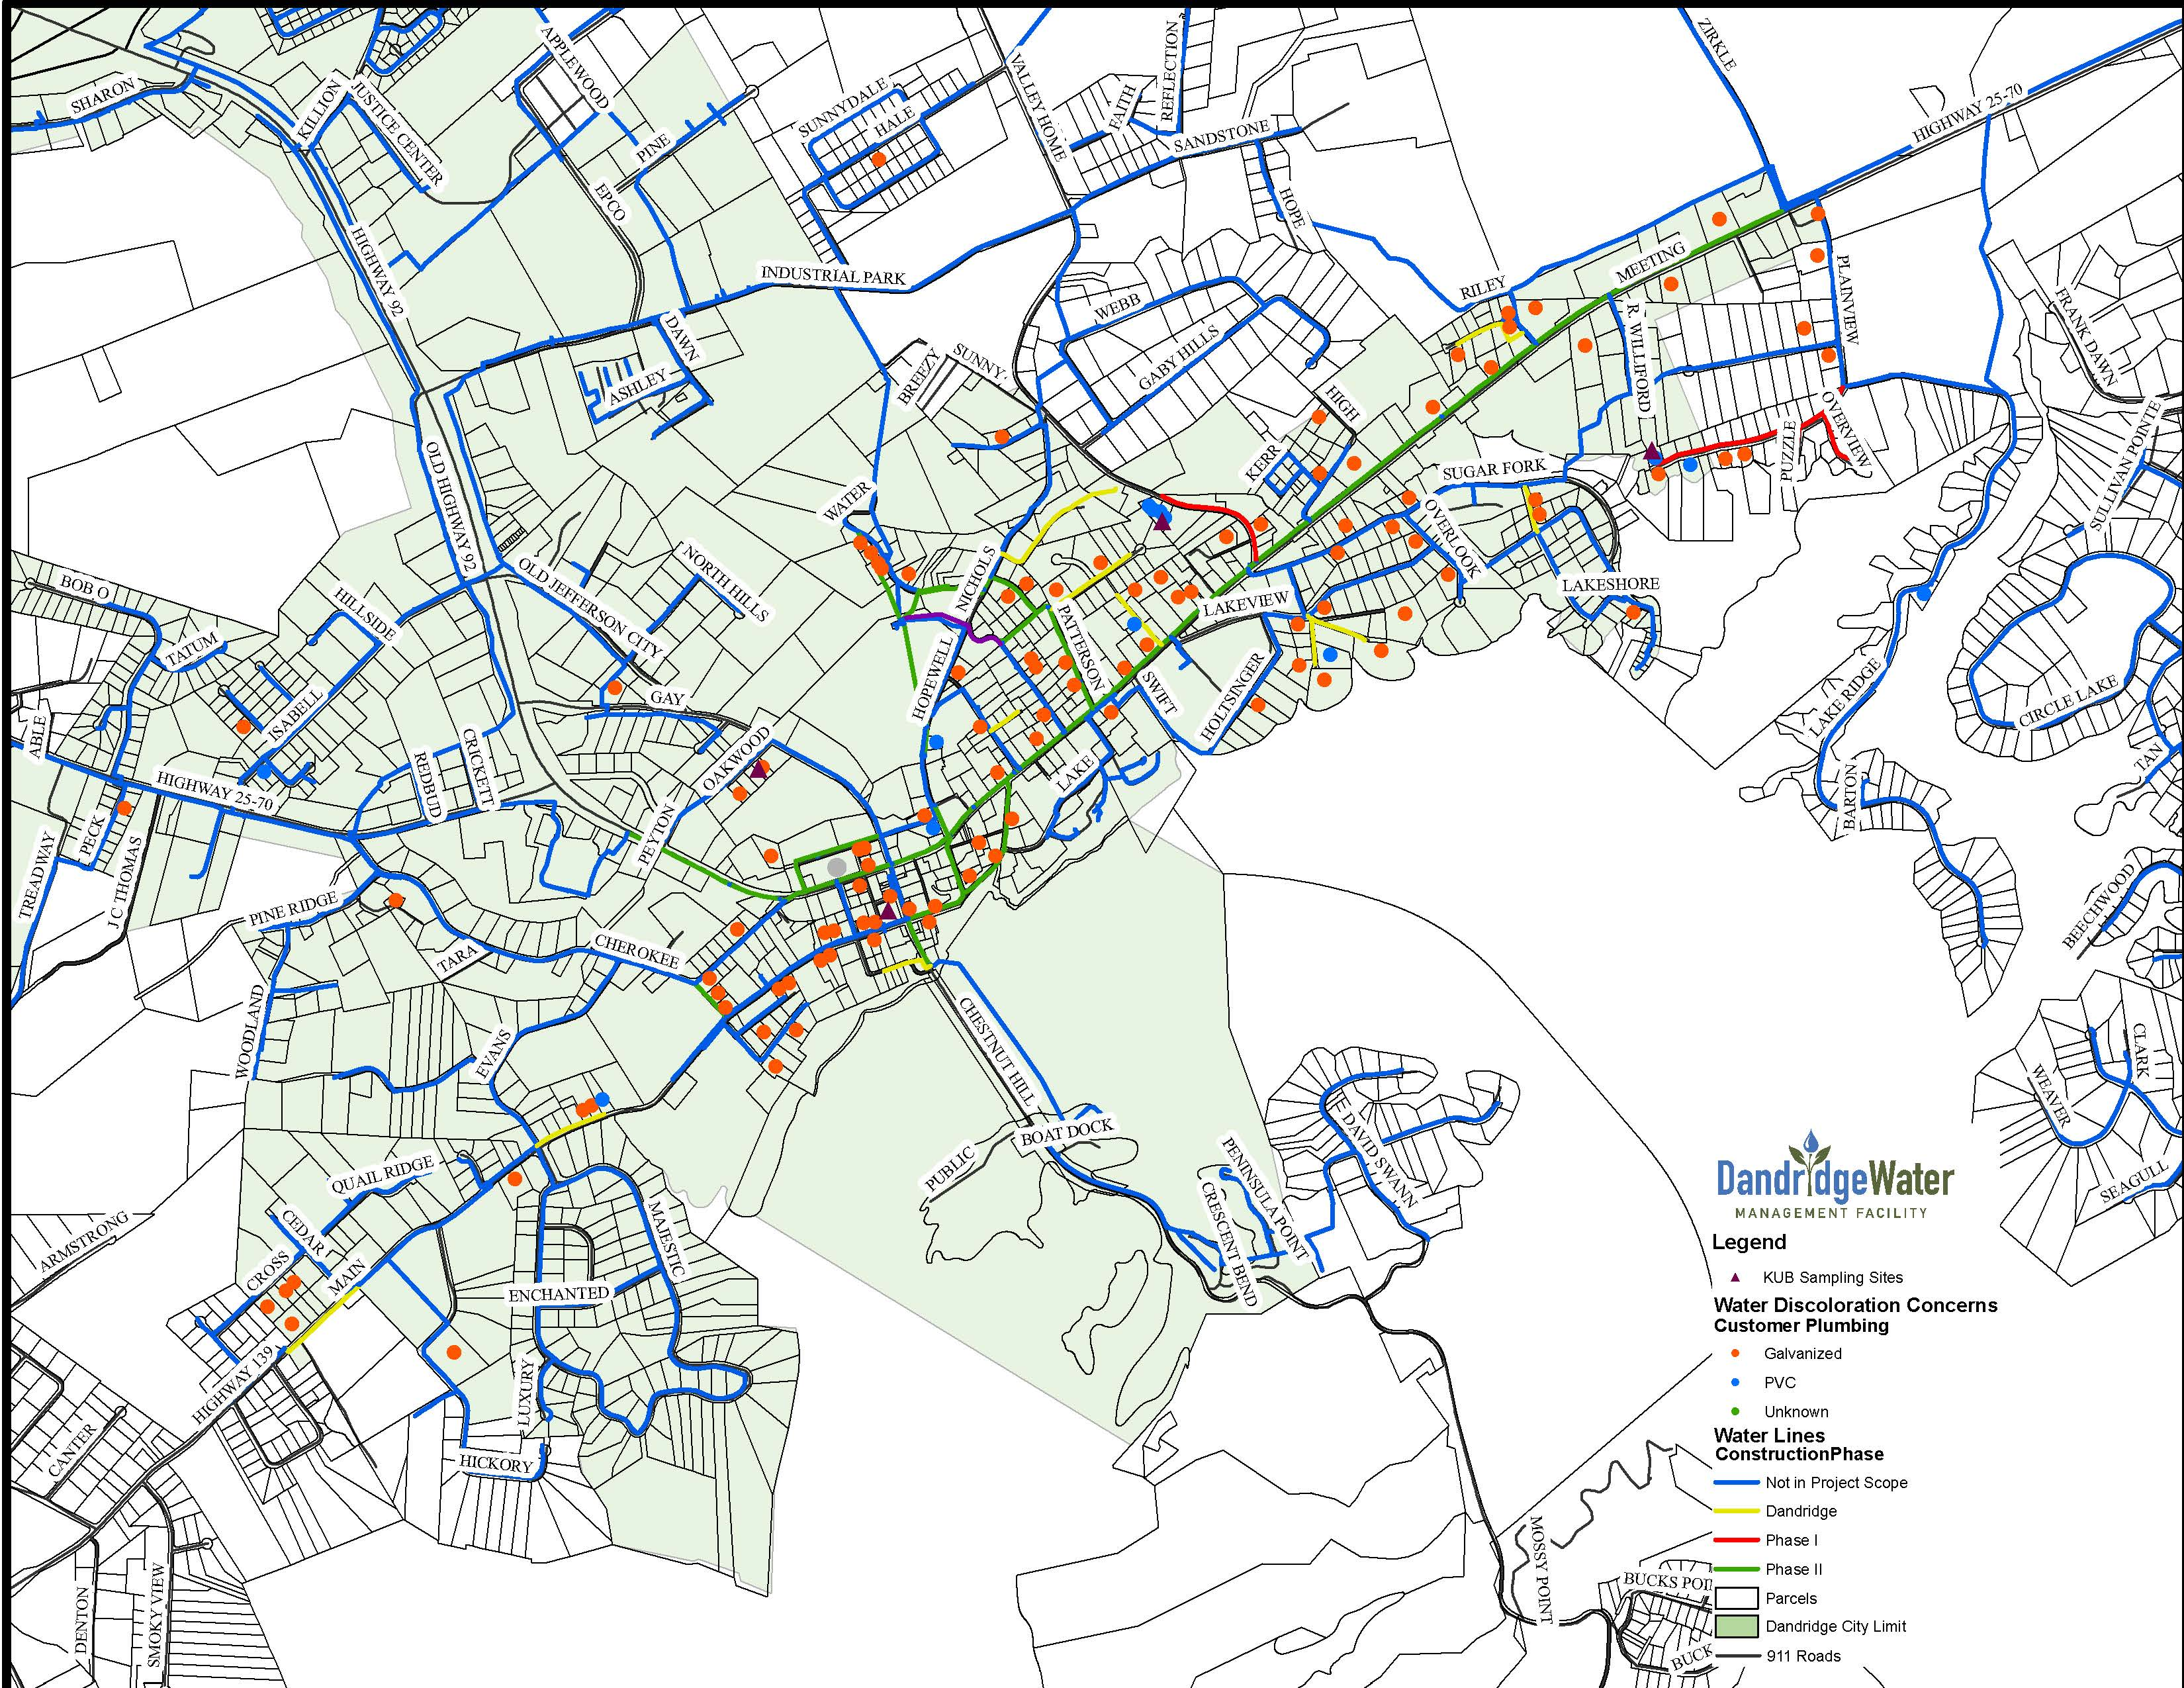 Dandridge Water – Management Facility on maury city tn map, sevier county tn map, saltillo tn map, sparta tn map, bradford tn map, florence tn map, three way tn map, seymour tn map, abingdon tn map, dickson tn map, winchester tn map, lebanon tn map, coalfield tn map, walling tn map, lawrenceburg tn map, jefferson county tn map, bell buckle tn map, louisville tn map, french broad river tn map, north knoxville tn map,